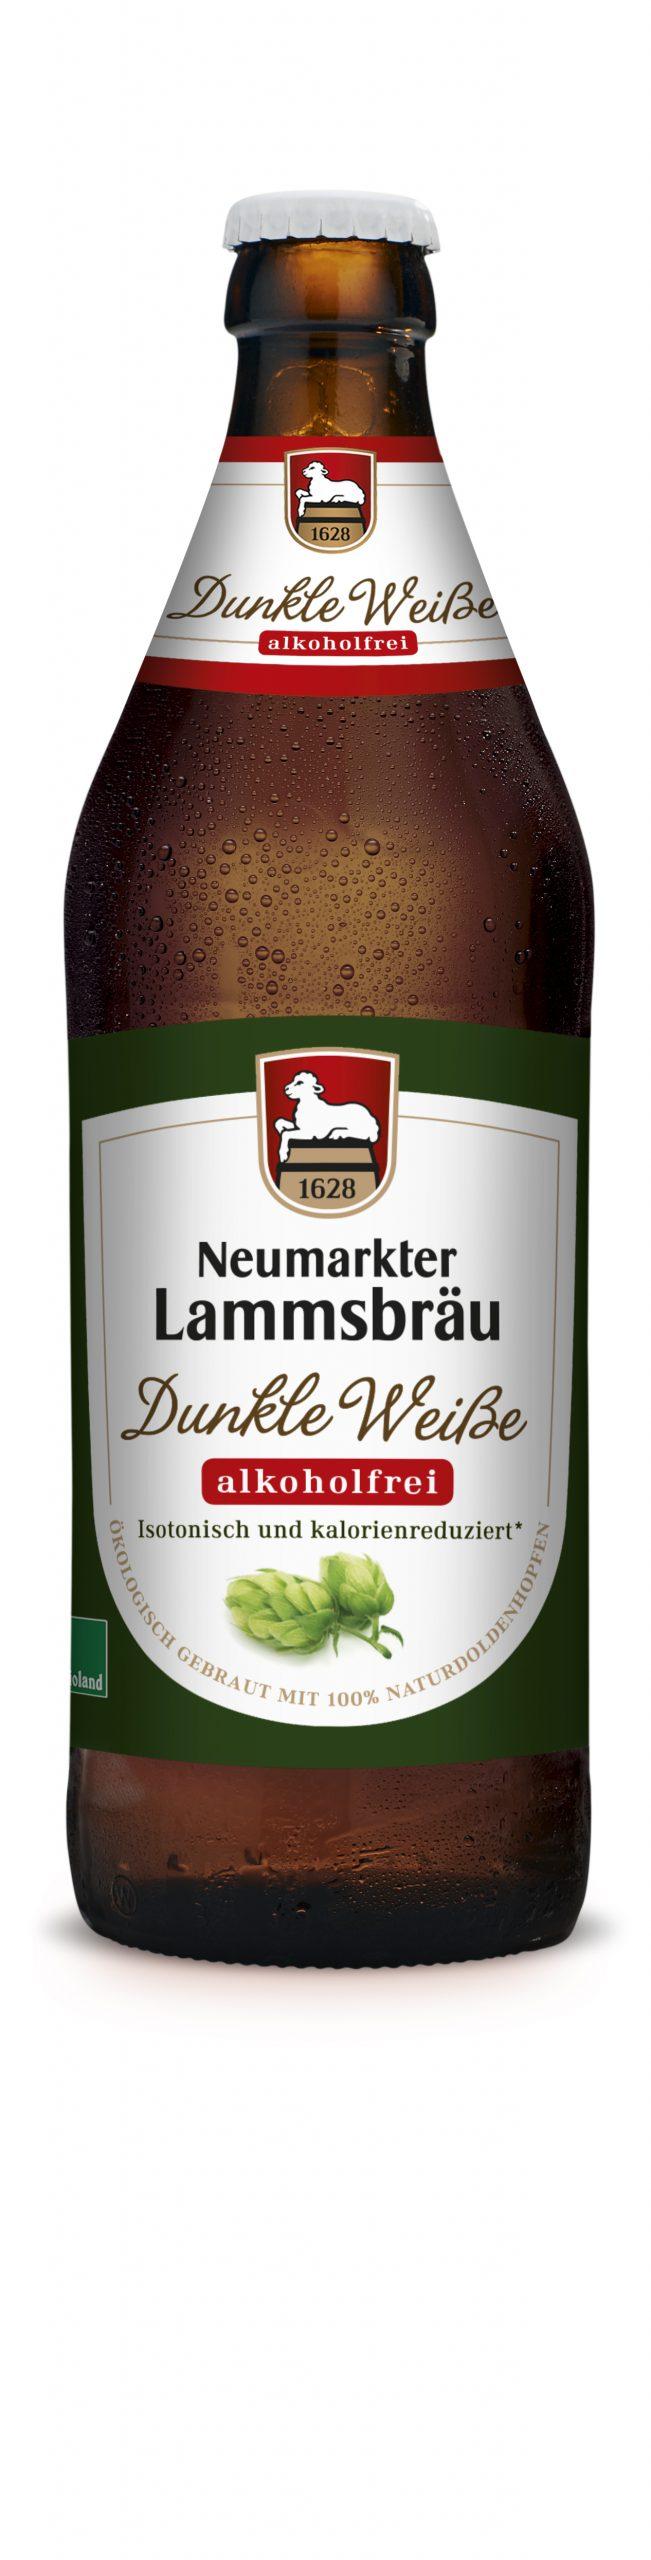 Neumarkter Lammsbräu Dunkle Weiße Alkoholfrei